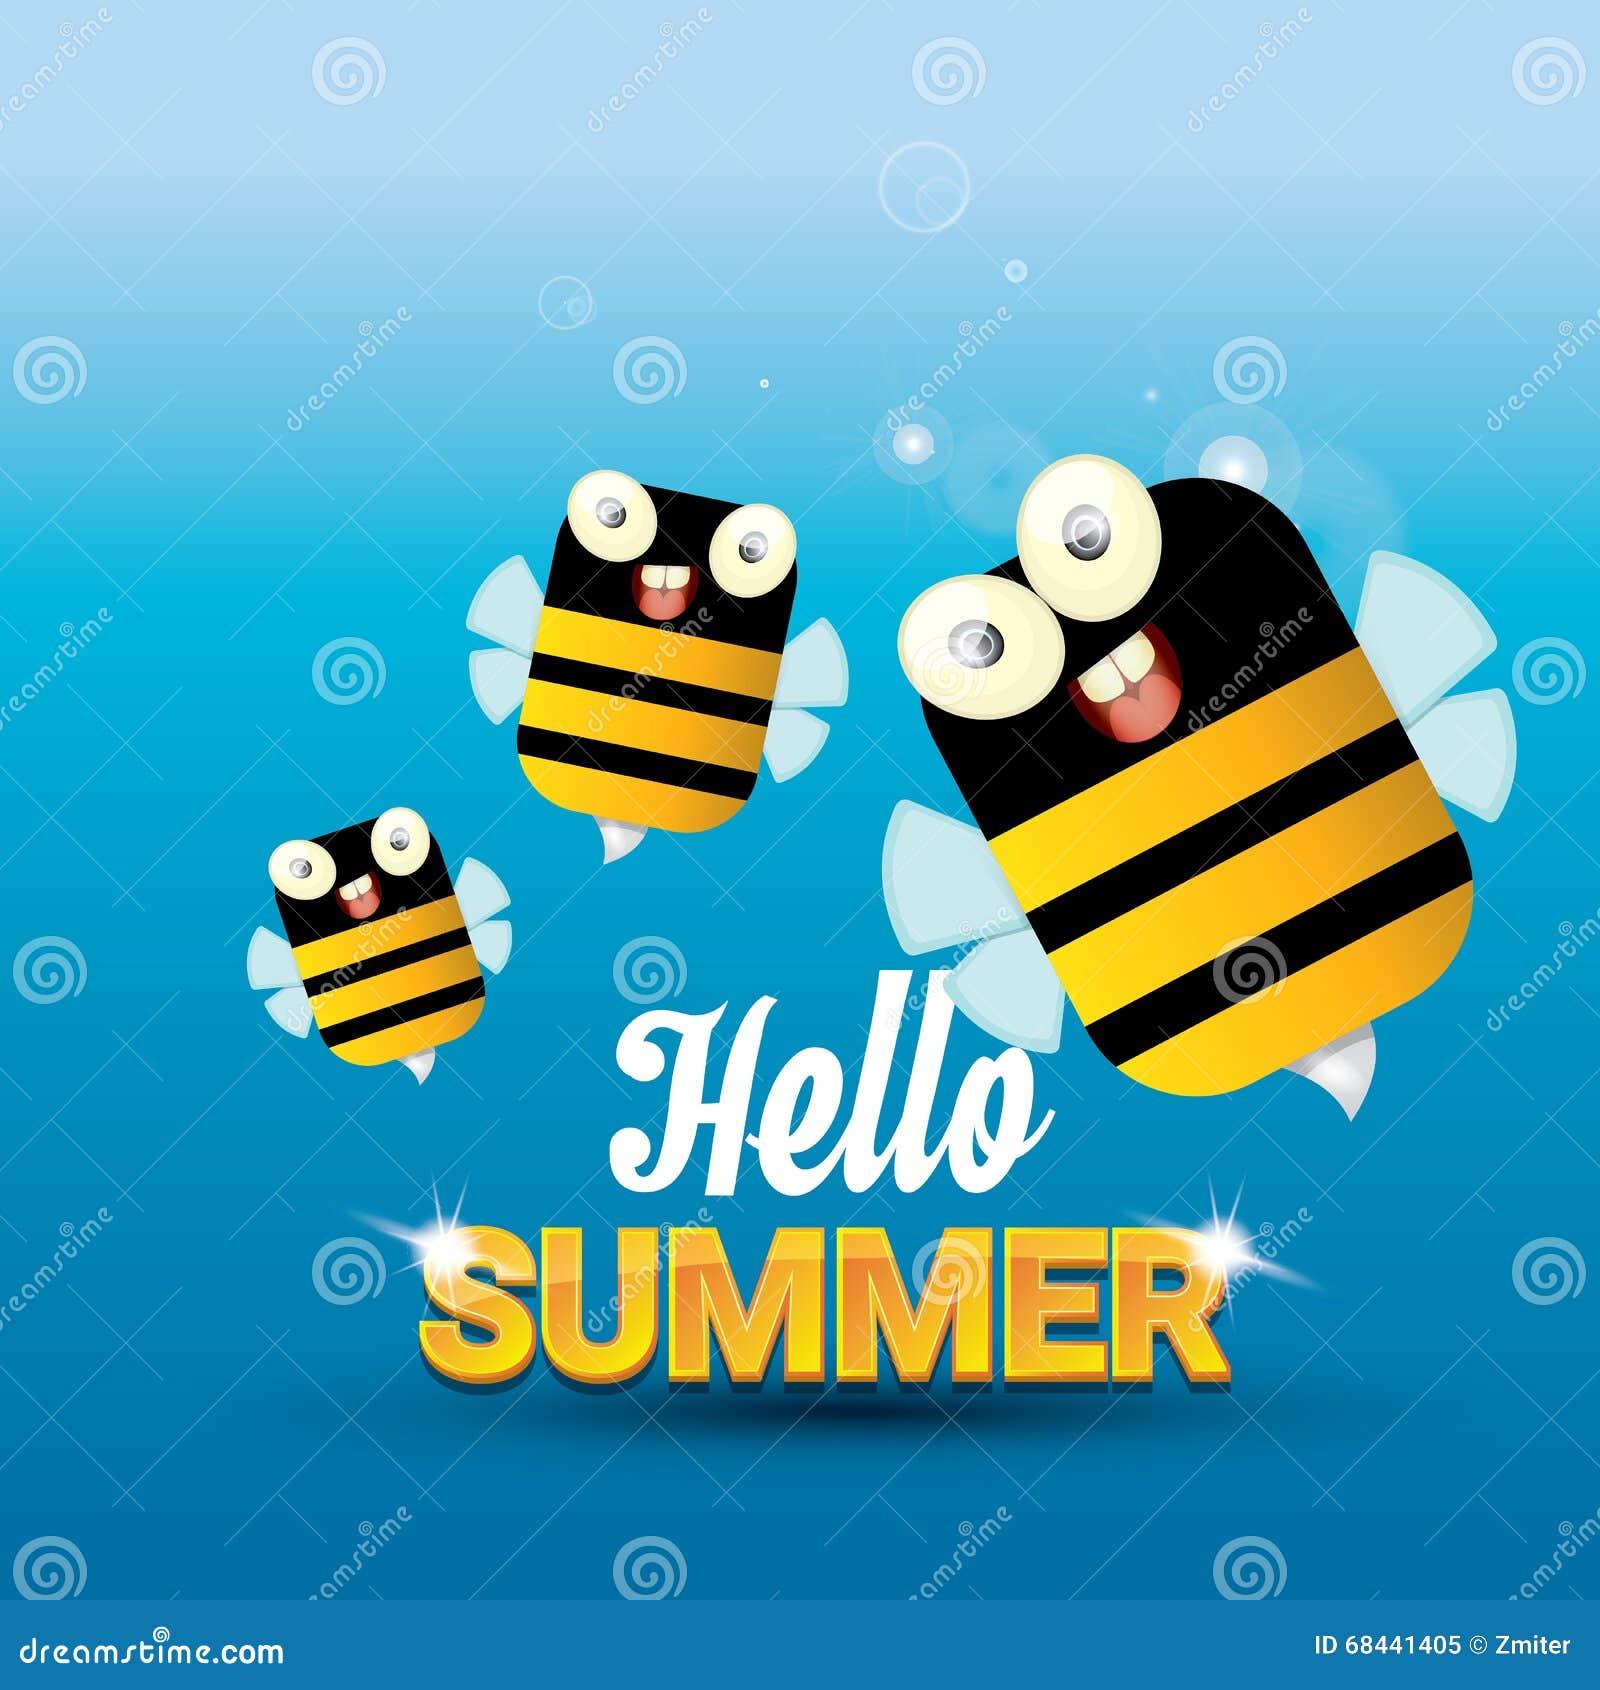 Hello Summer Vector Background. Funny Cartoons Bee Stock Illustration - Image...